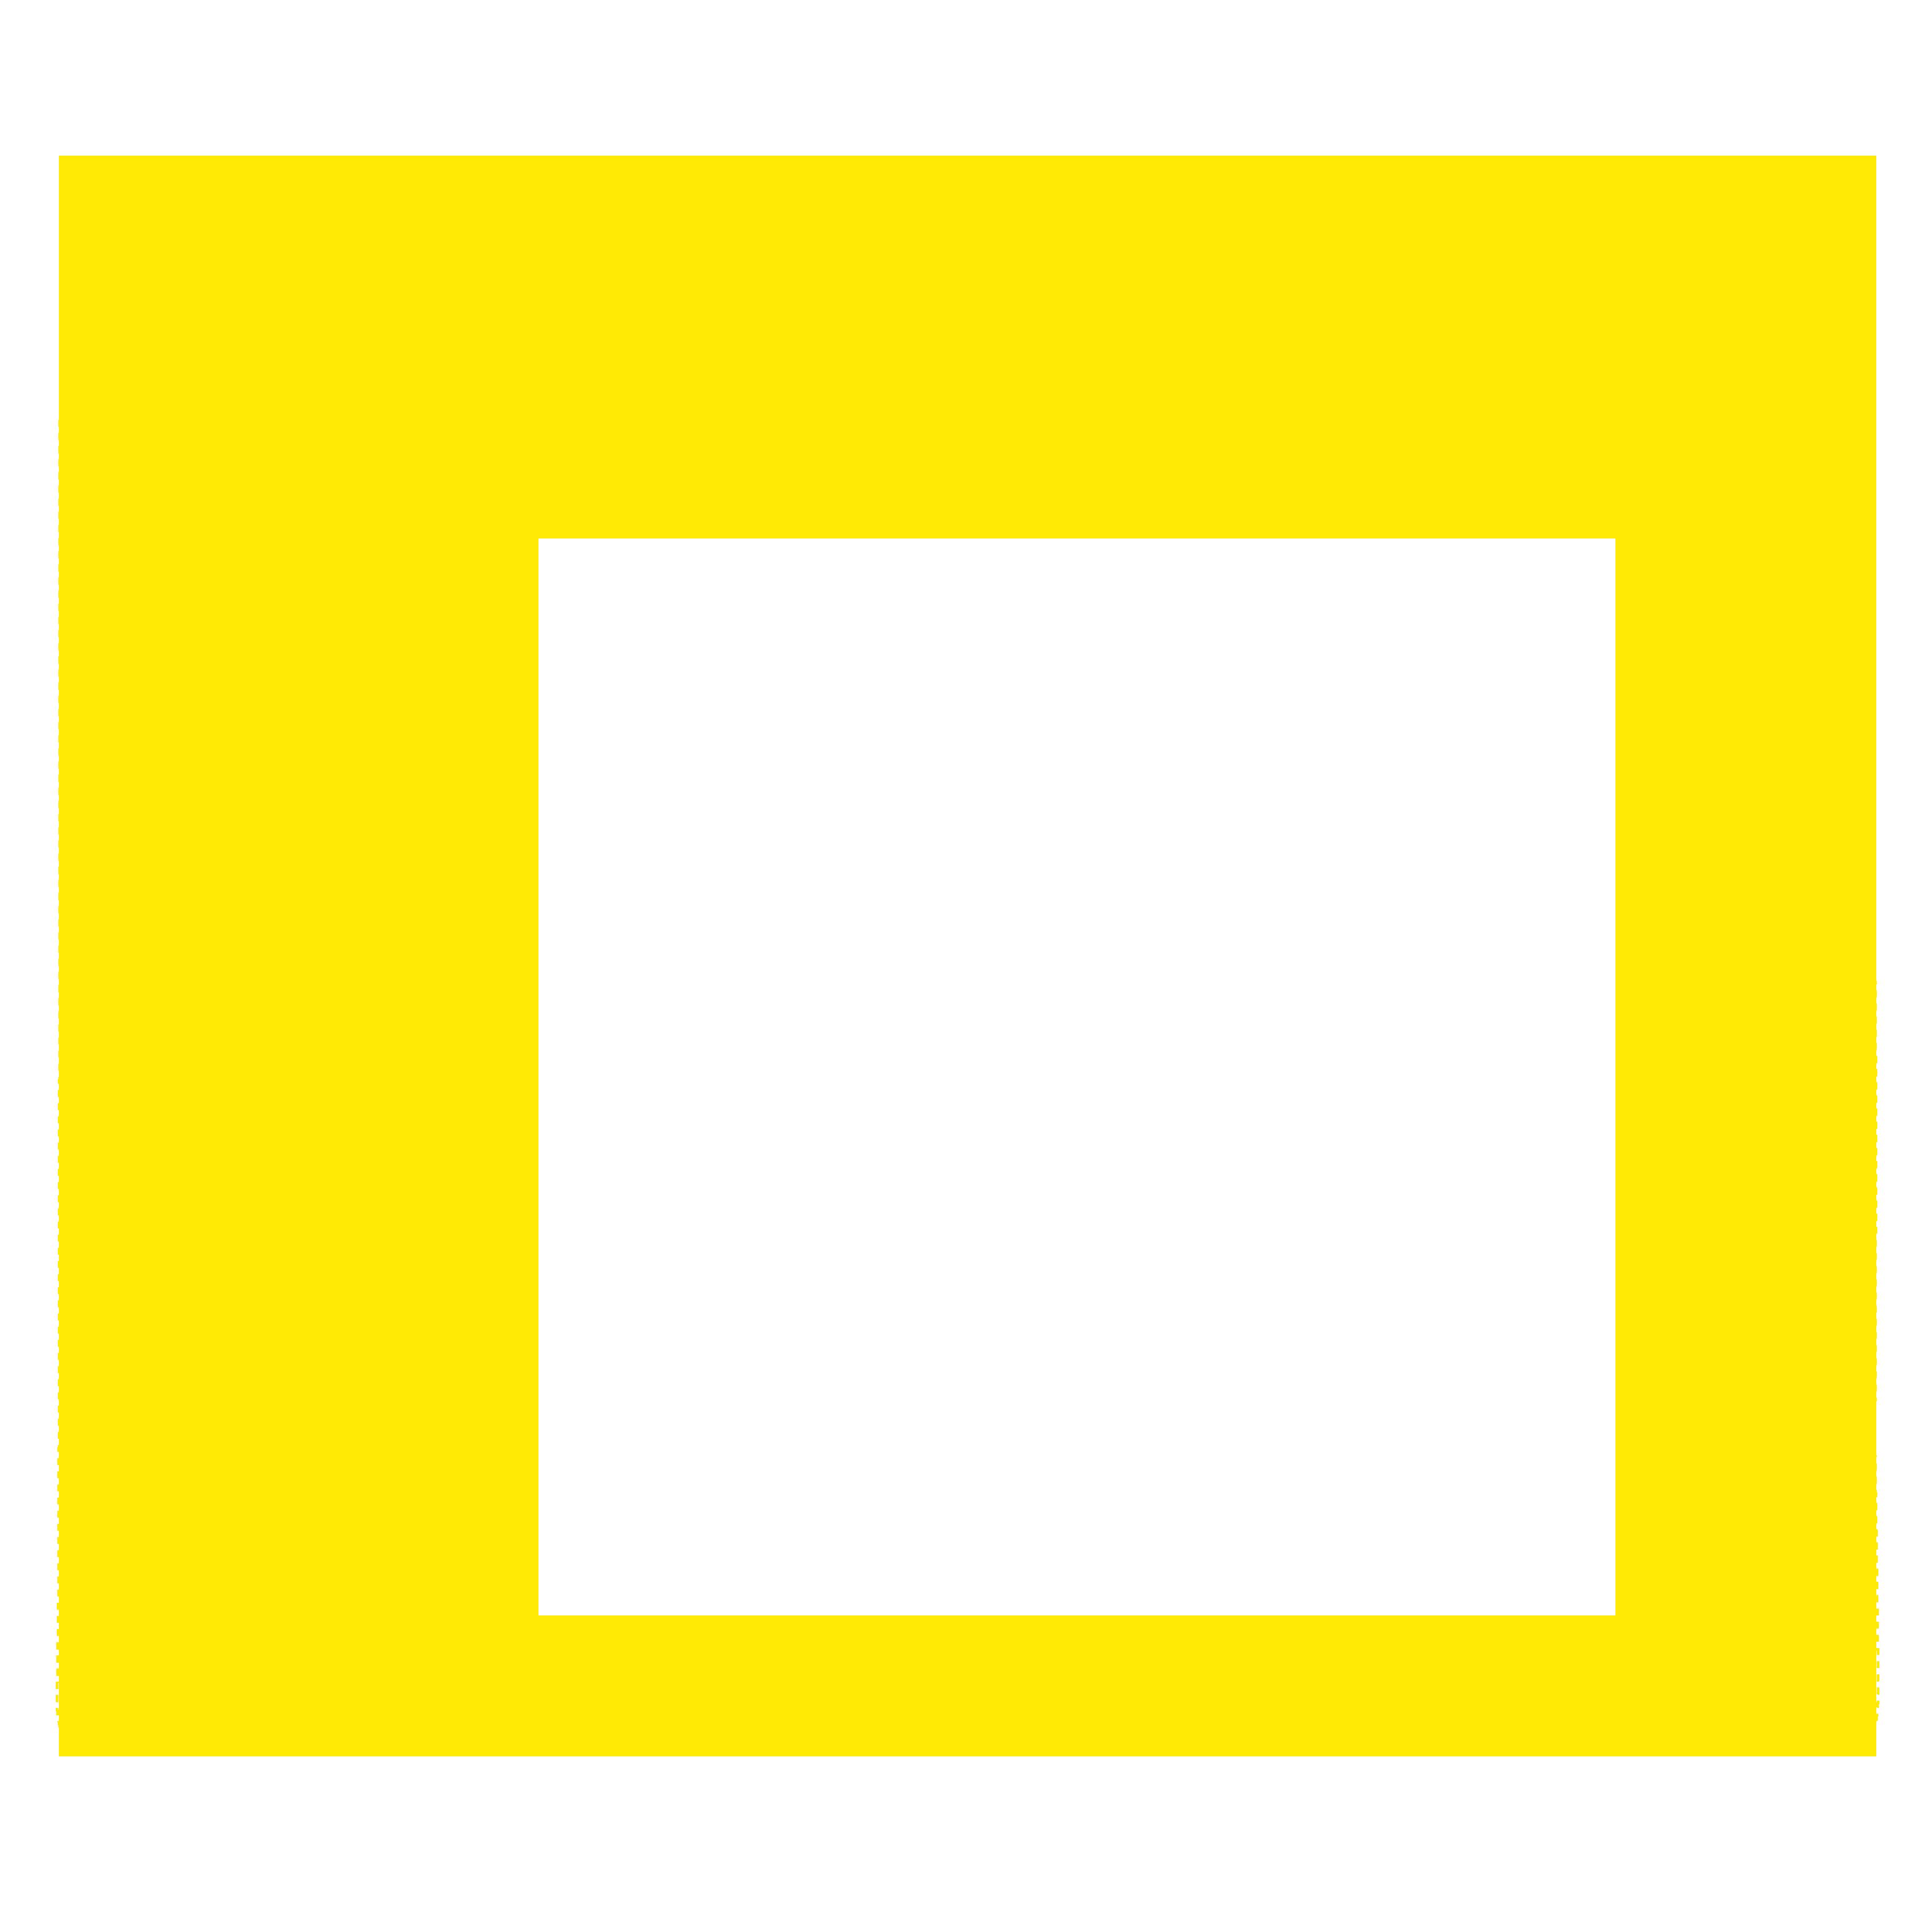 Floor Mats Concept